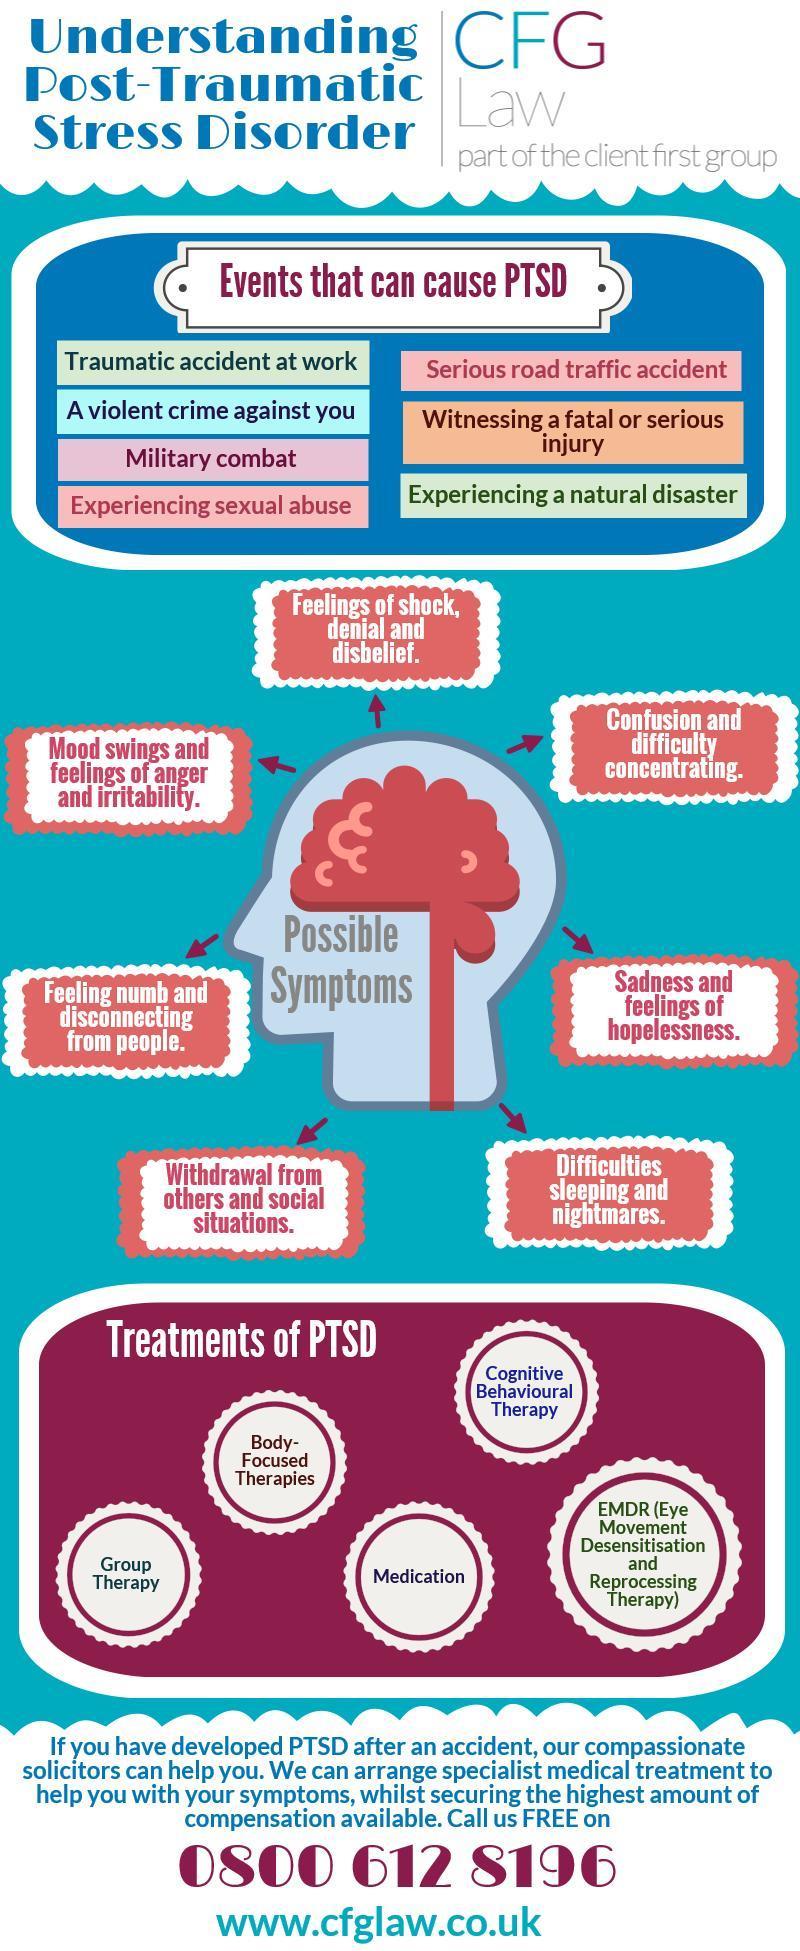 Understanding-Post-Traumatic-Stress-Disorder-1